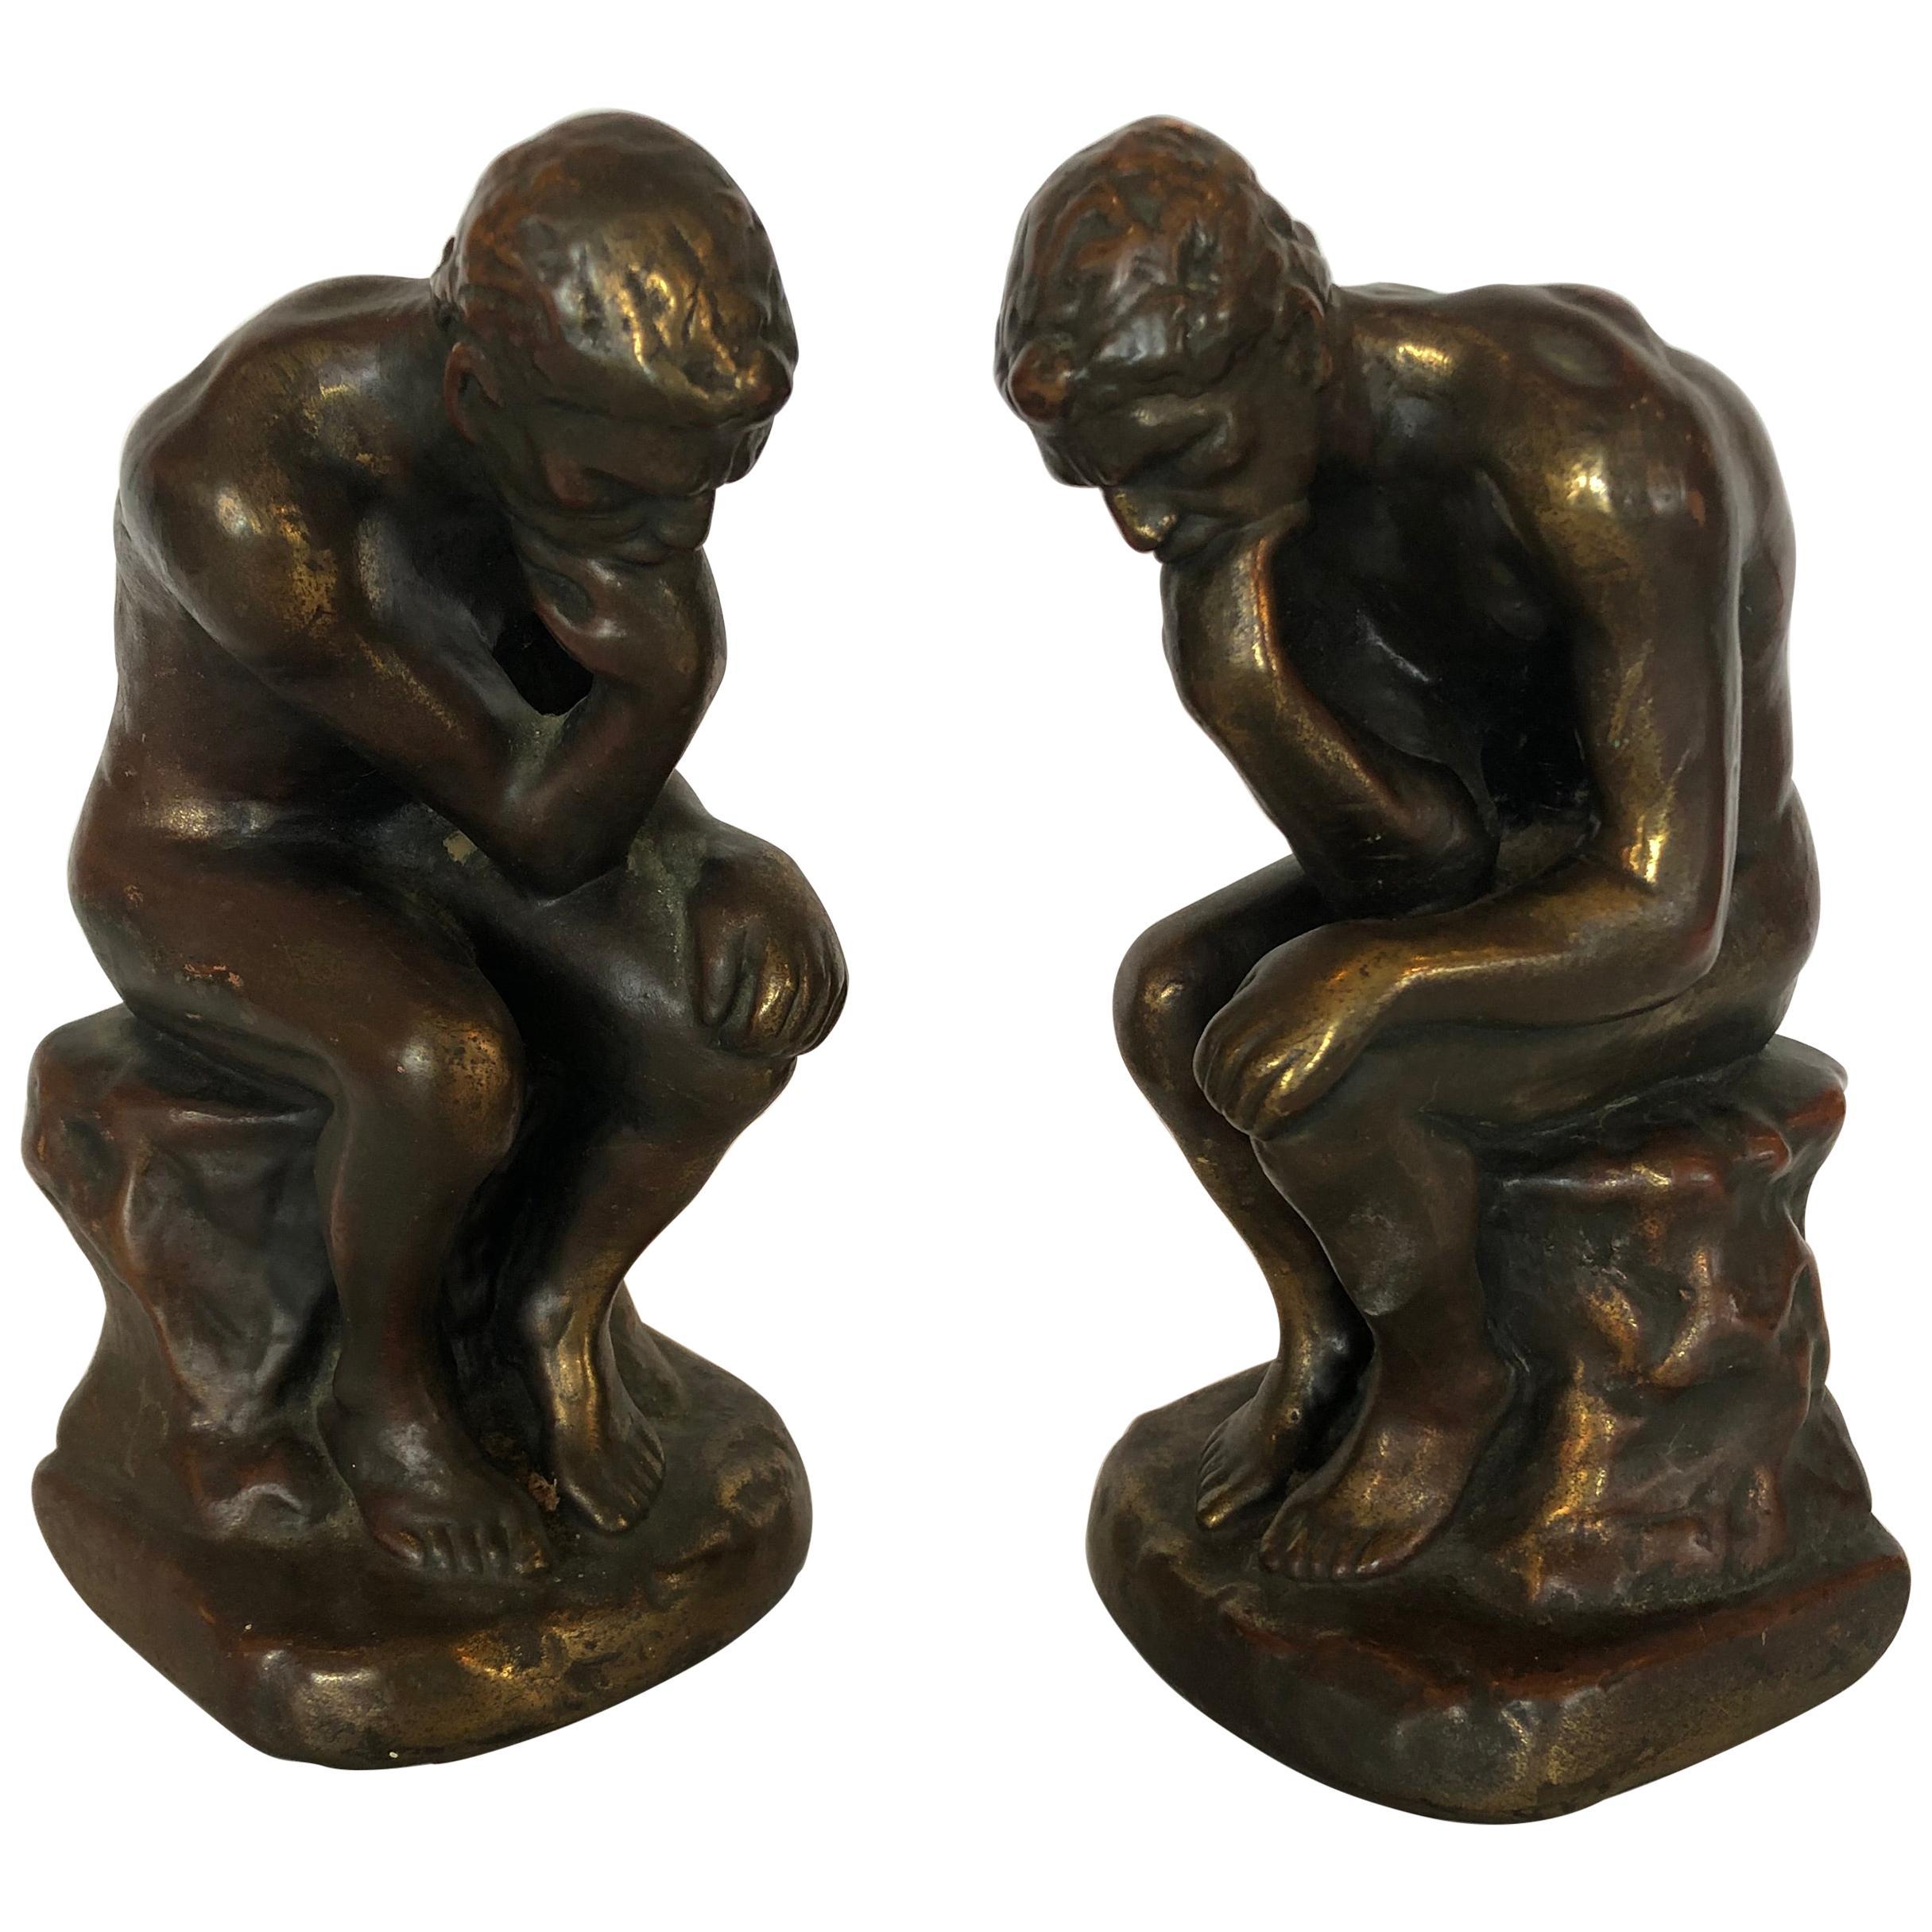 Masculine Bronze Clad Male Nude Bookends